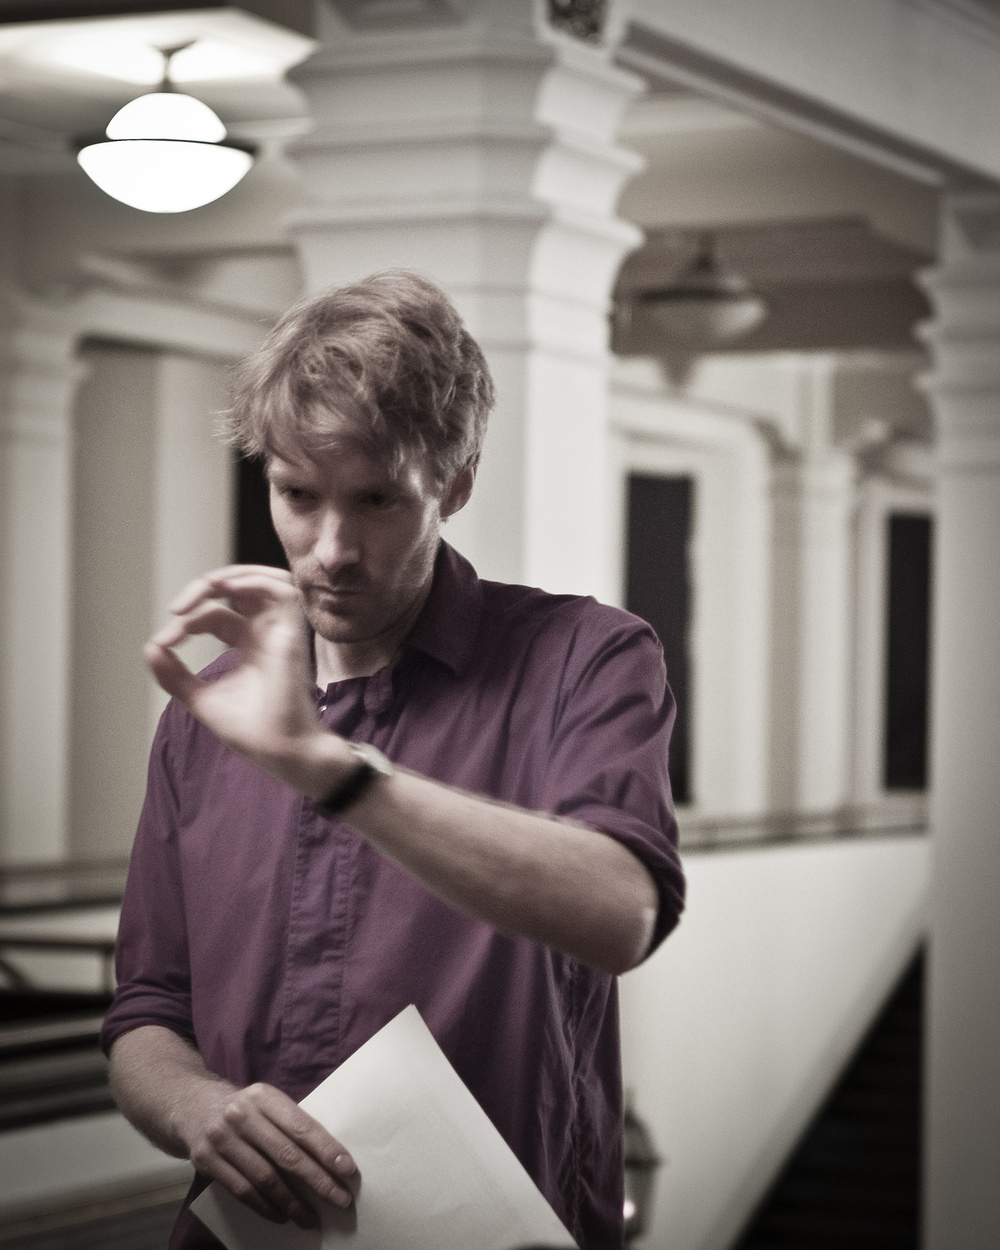 Ethan L - Moritz Gagern